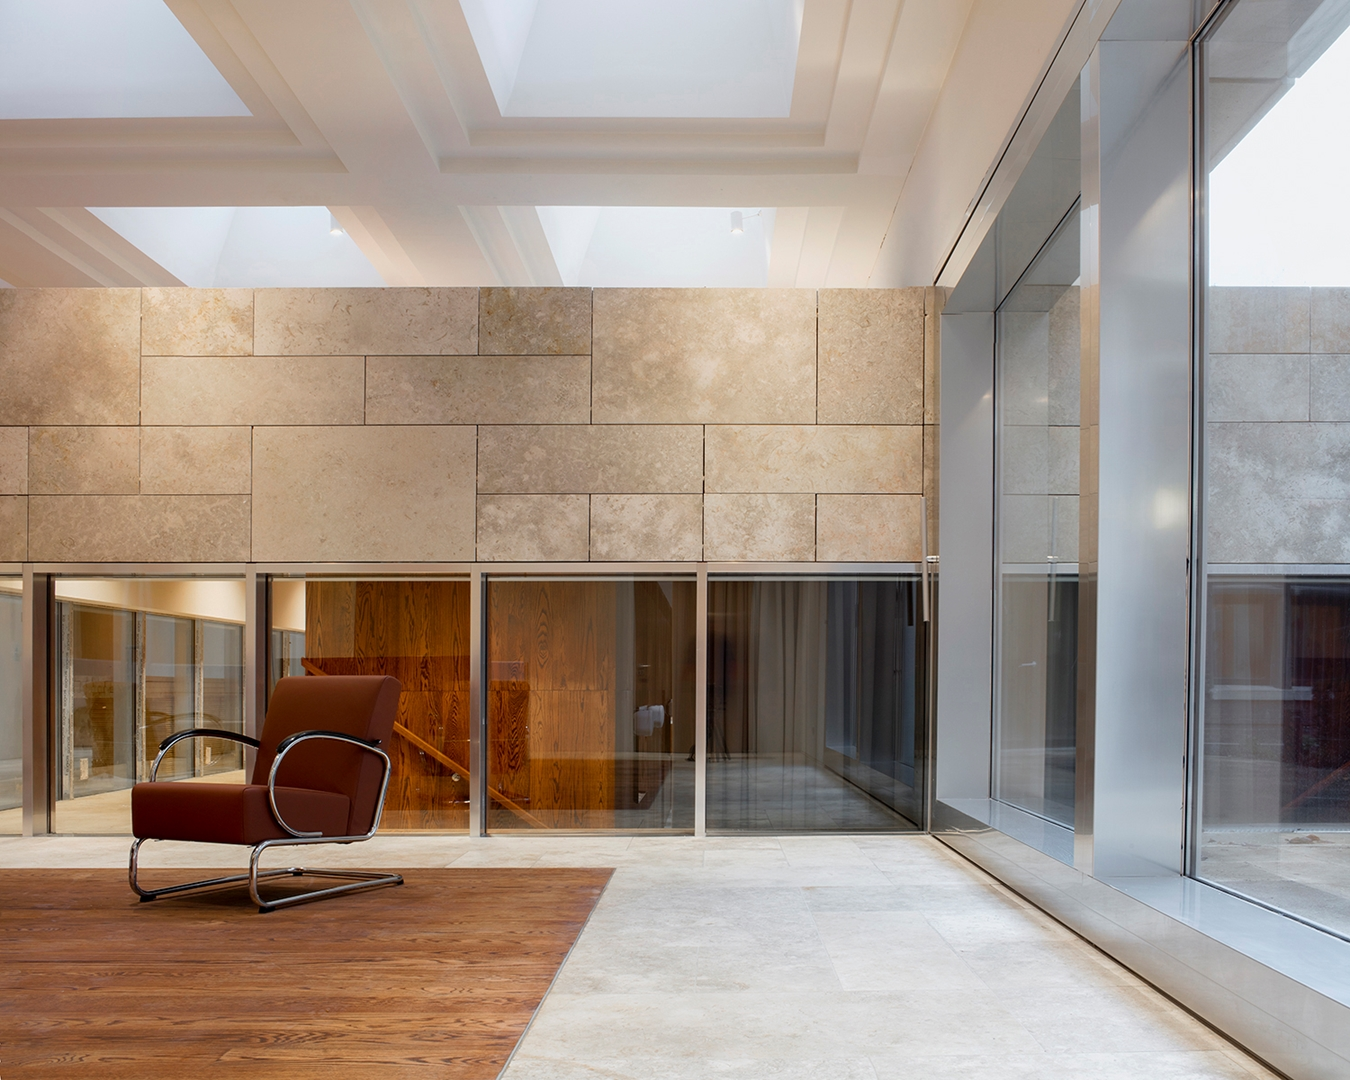 9_B30_KAAN Architecten ©Karin Borghouts (Copy)